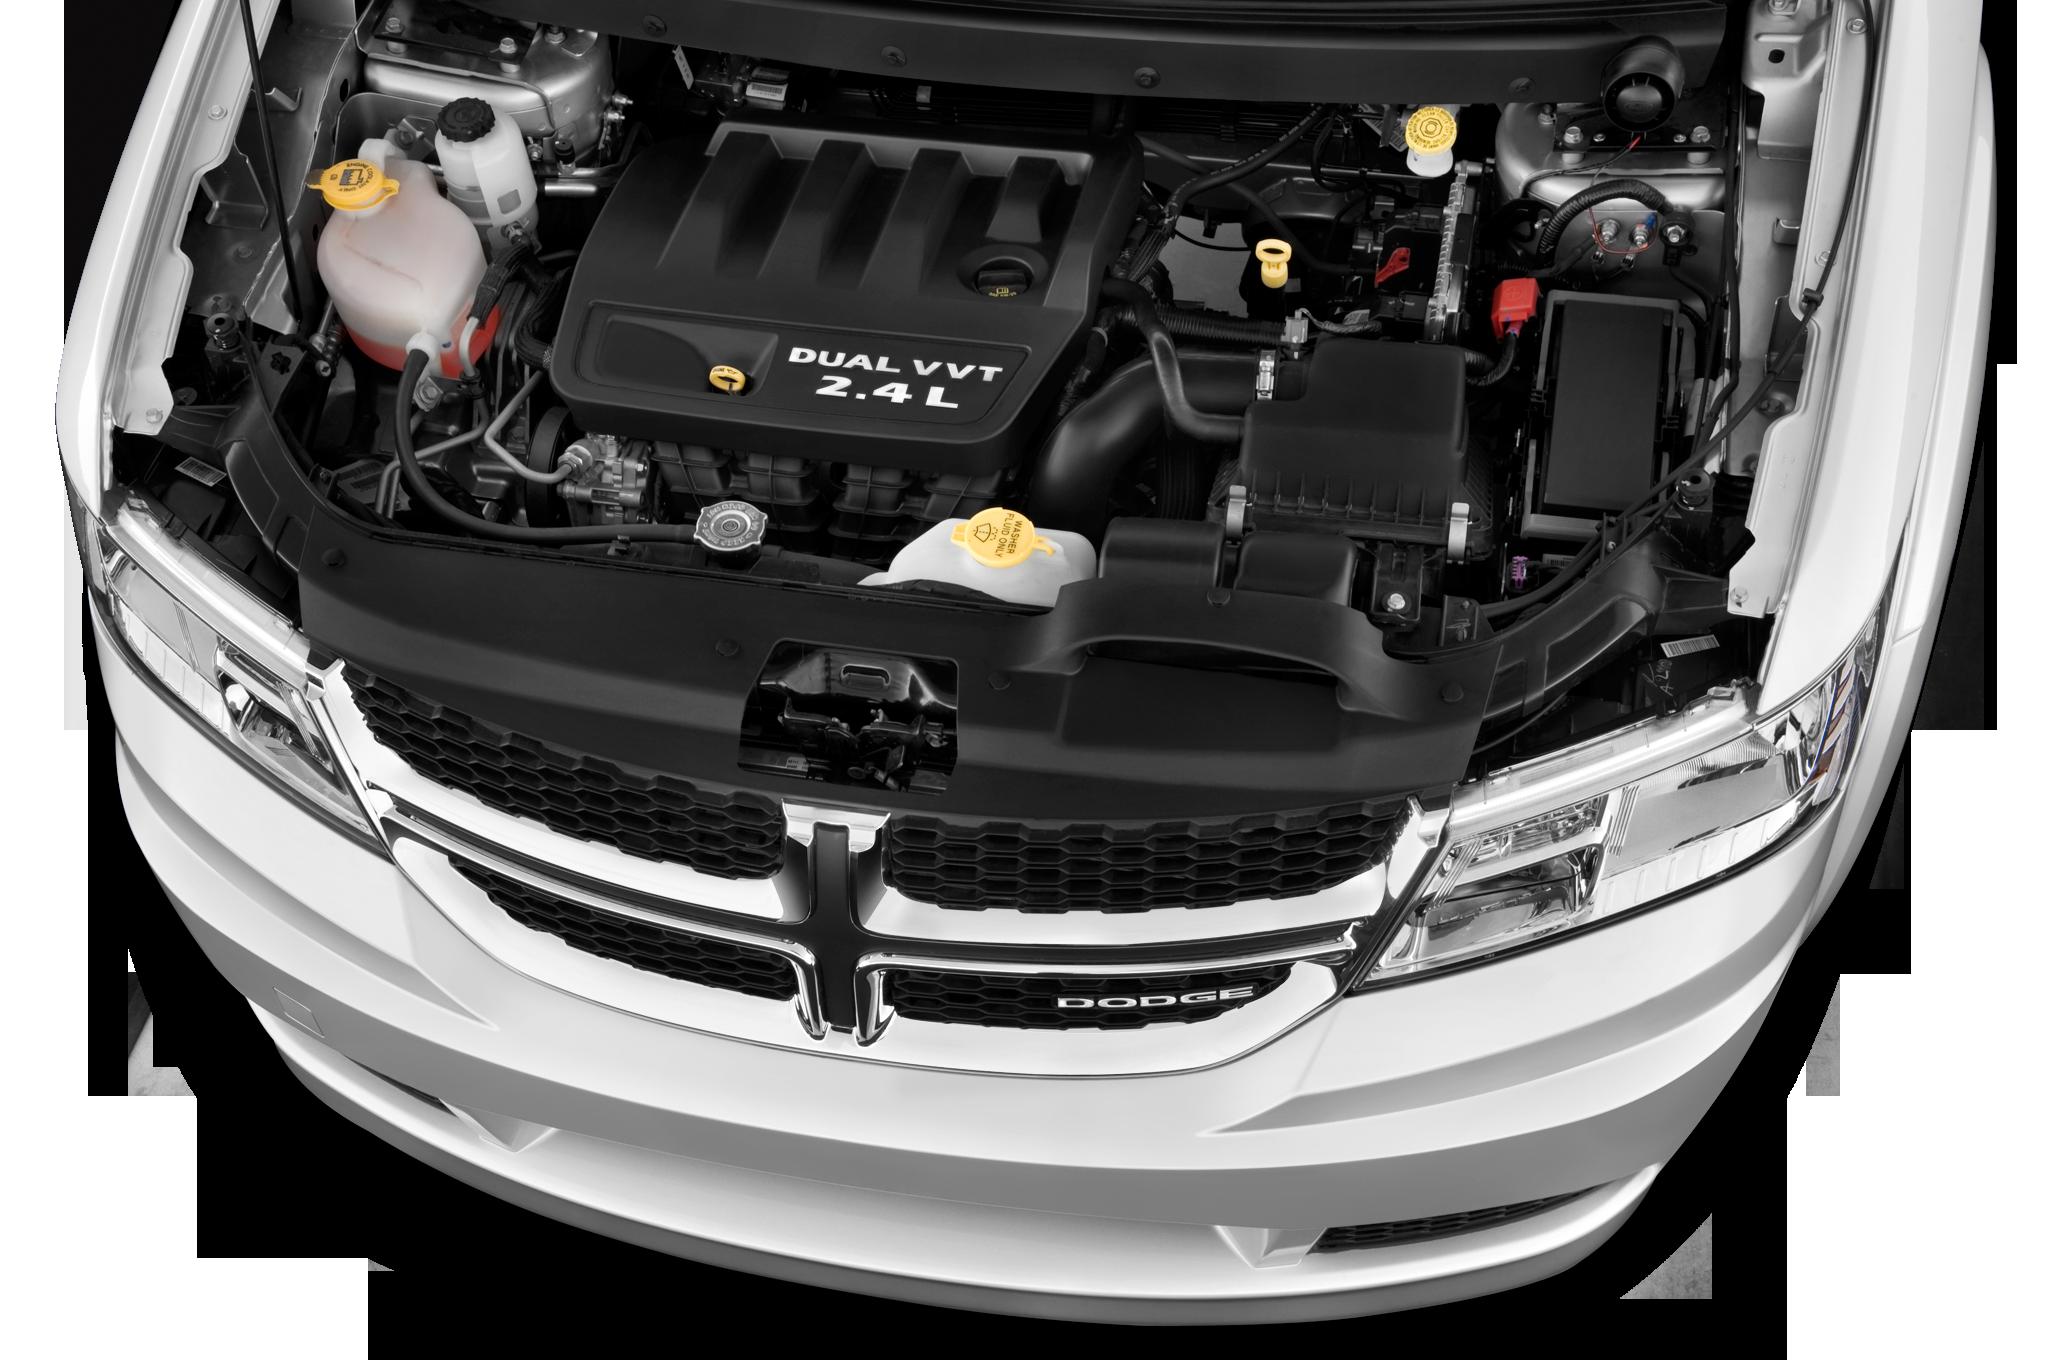 2015 Dodge Grand Caravan Engine Diagram Explained Wiring Diagrams 2014 2013 Journey Block And Schematic U2022 Chrysler 33